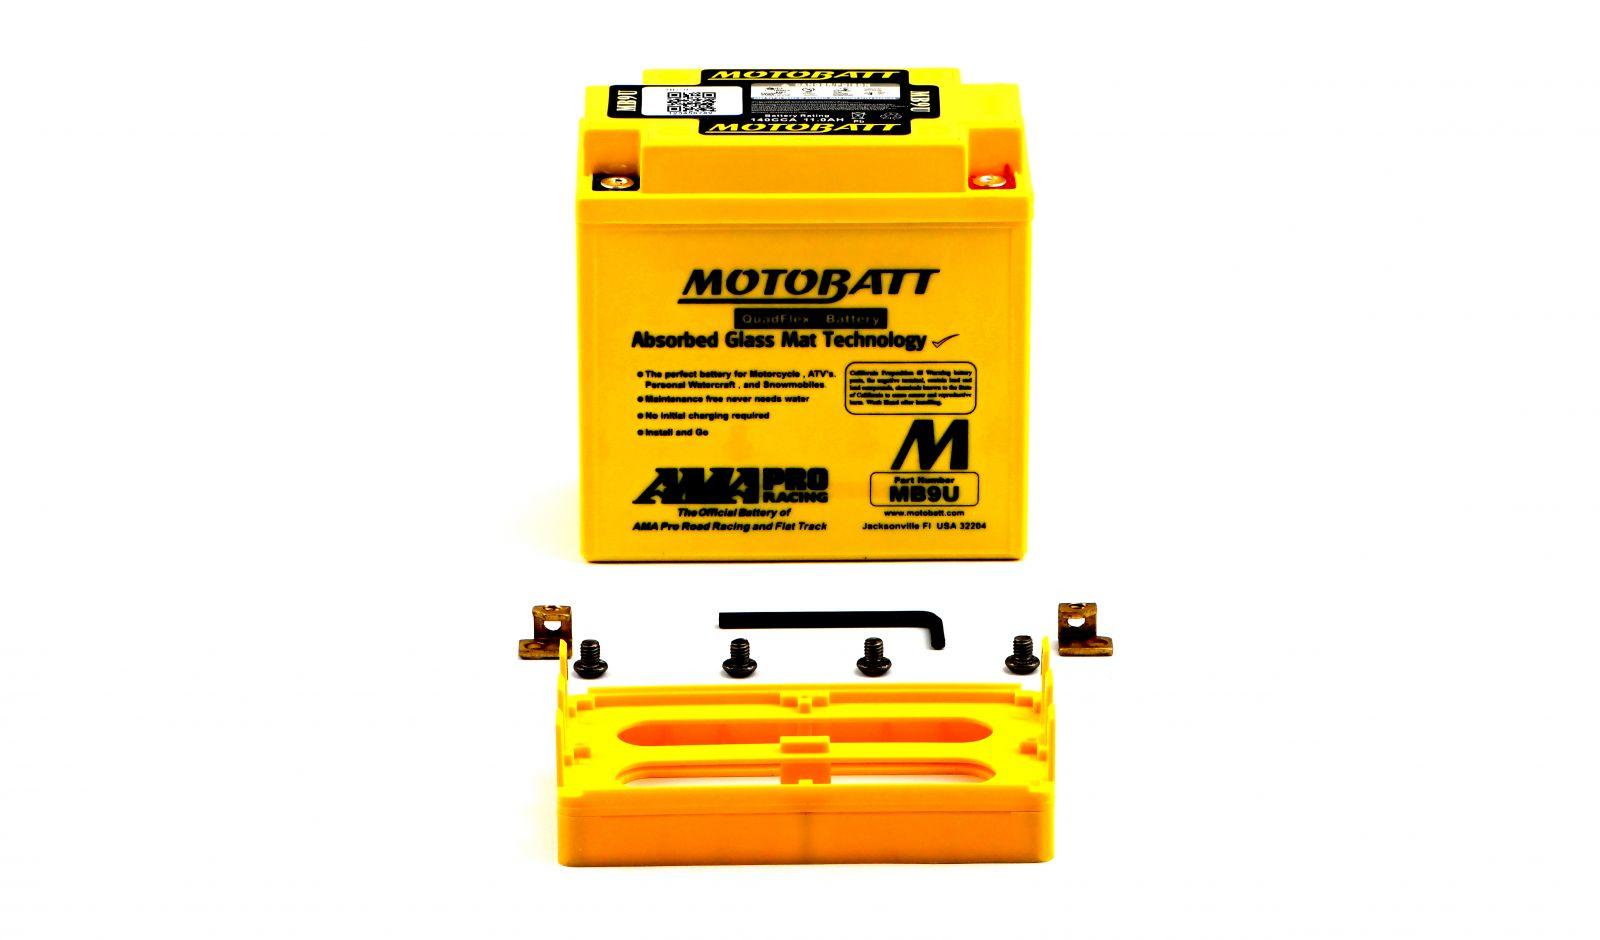 Motobatt Batteries - 501090MY image